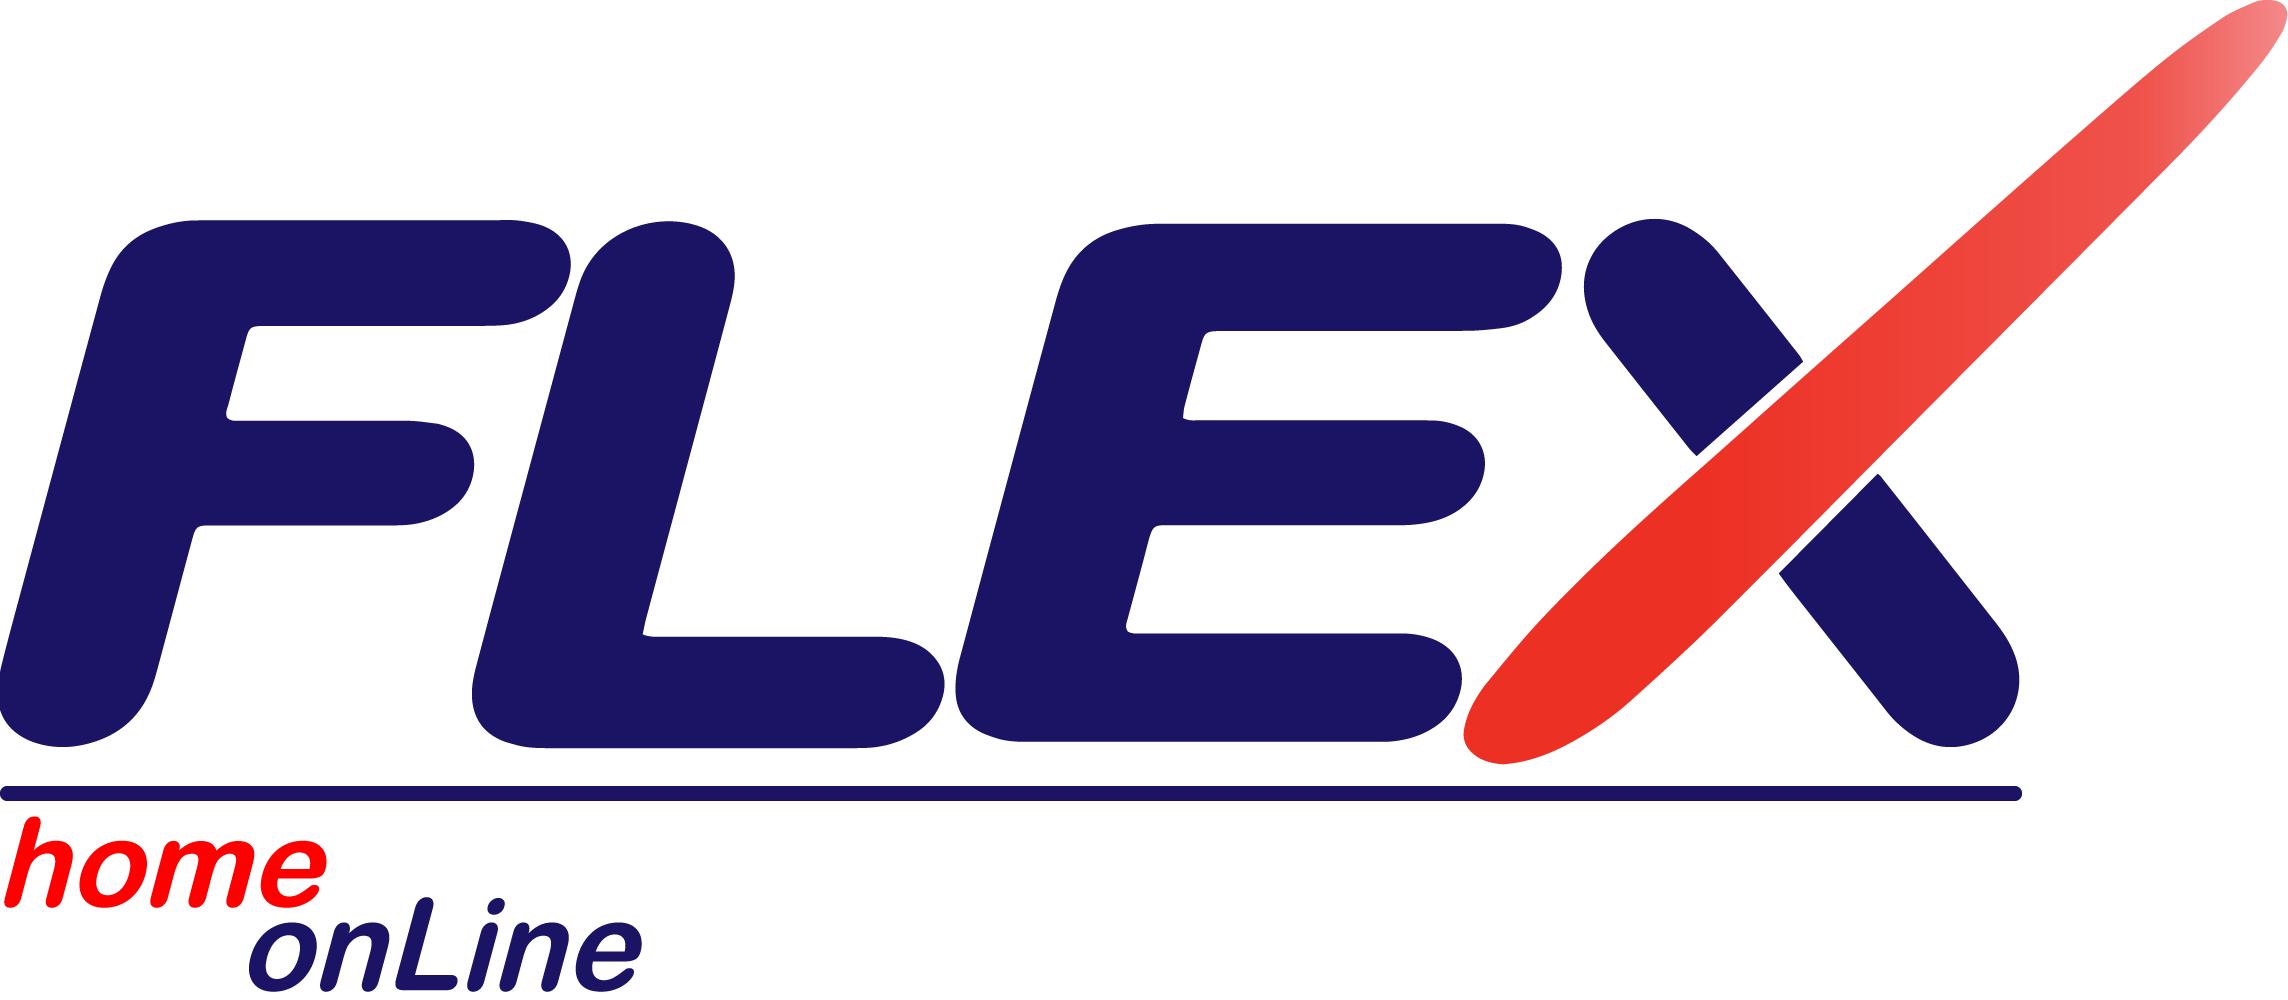 Flex Home Online